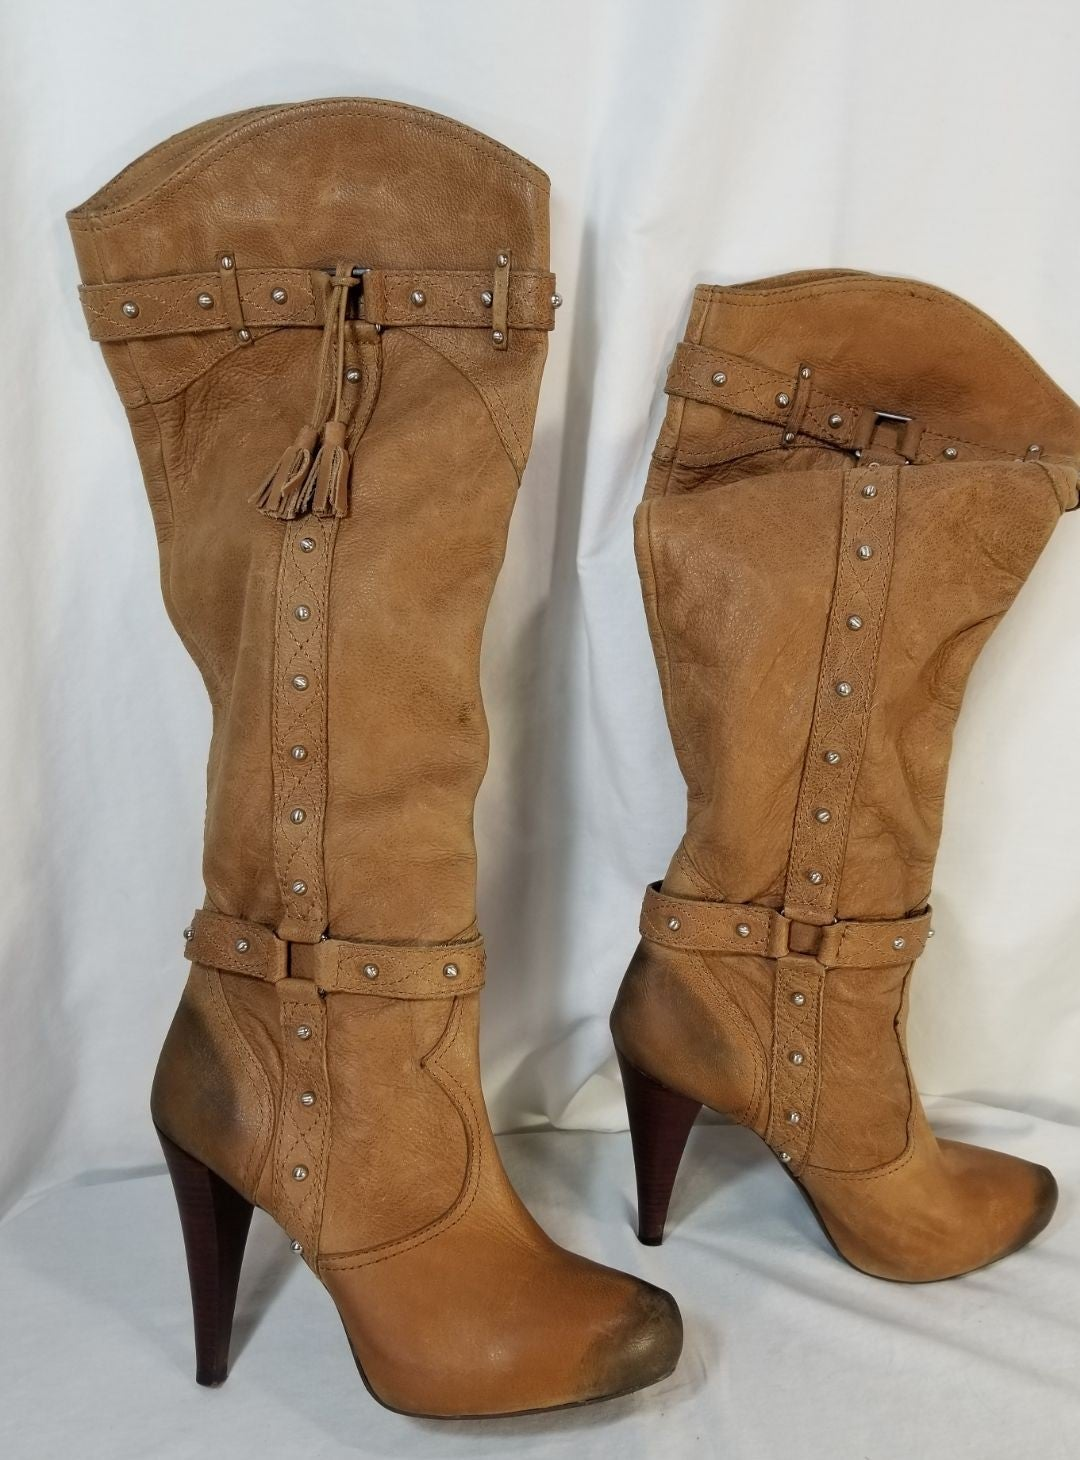 gianni bini Knee High Heel Learher Boots